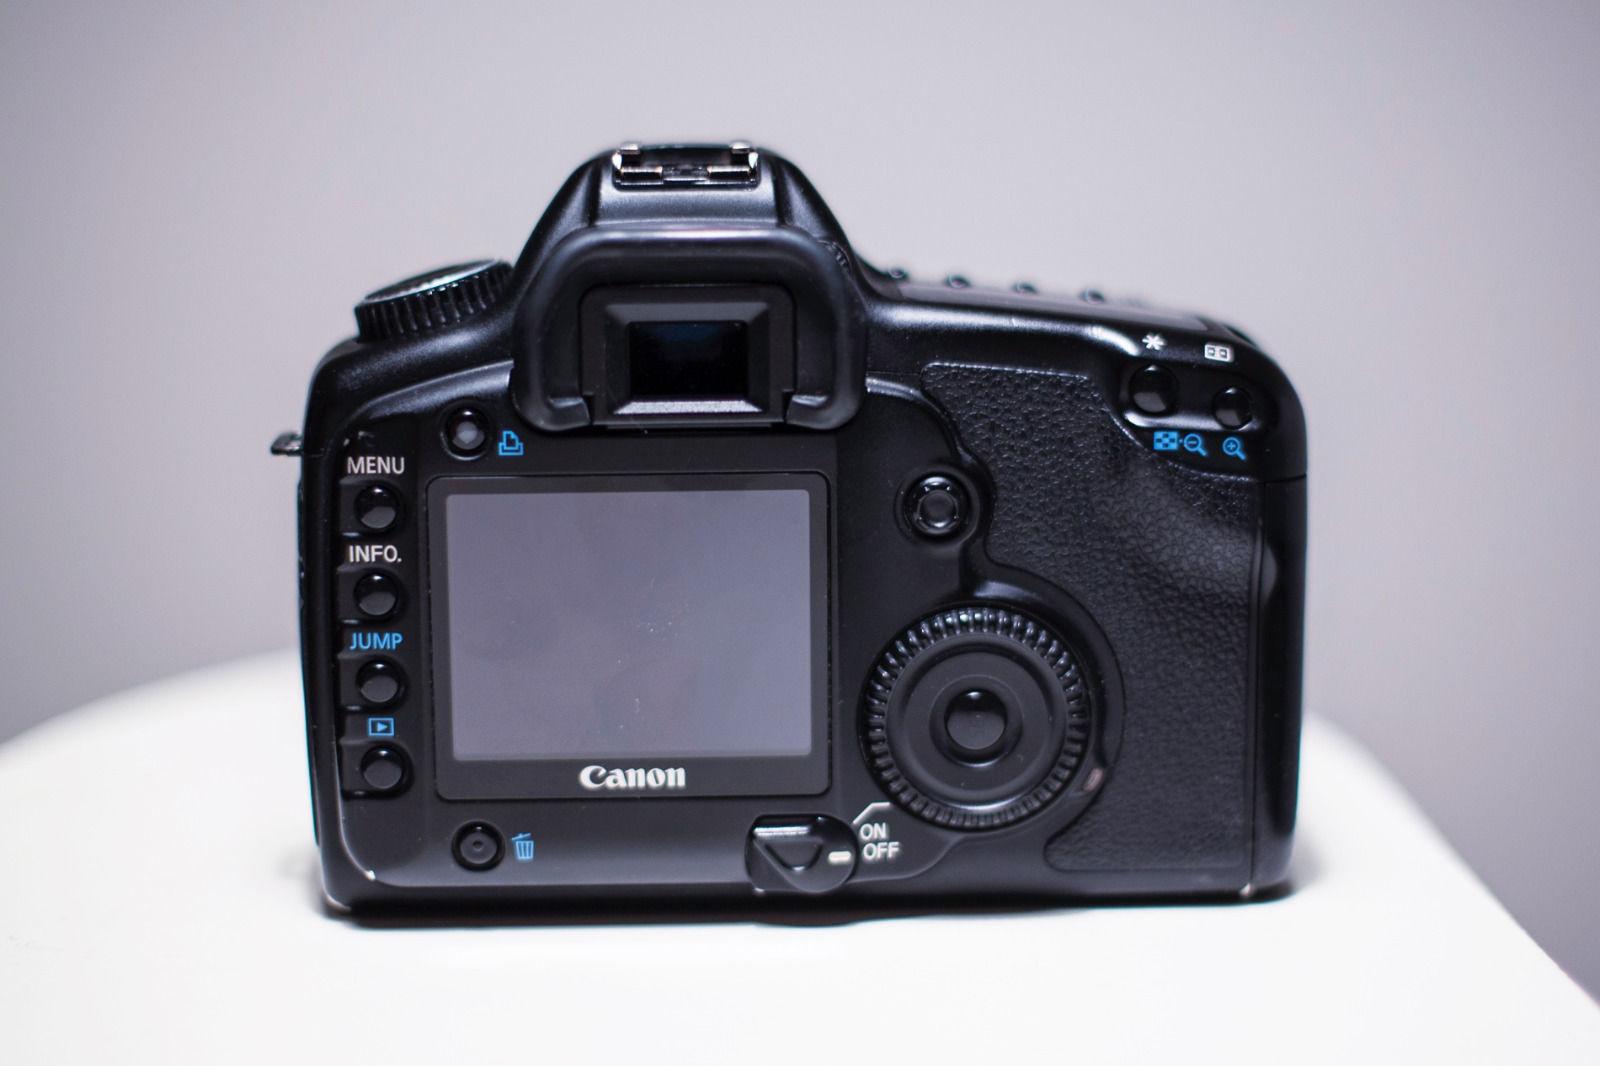 Canon EOS 5D Classic die perfekte Kamera fr den preisbewussten Profi   Martin Frick Fotograf